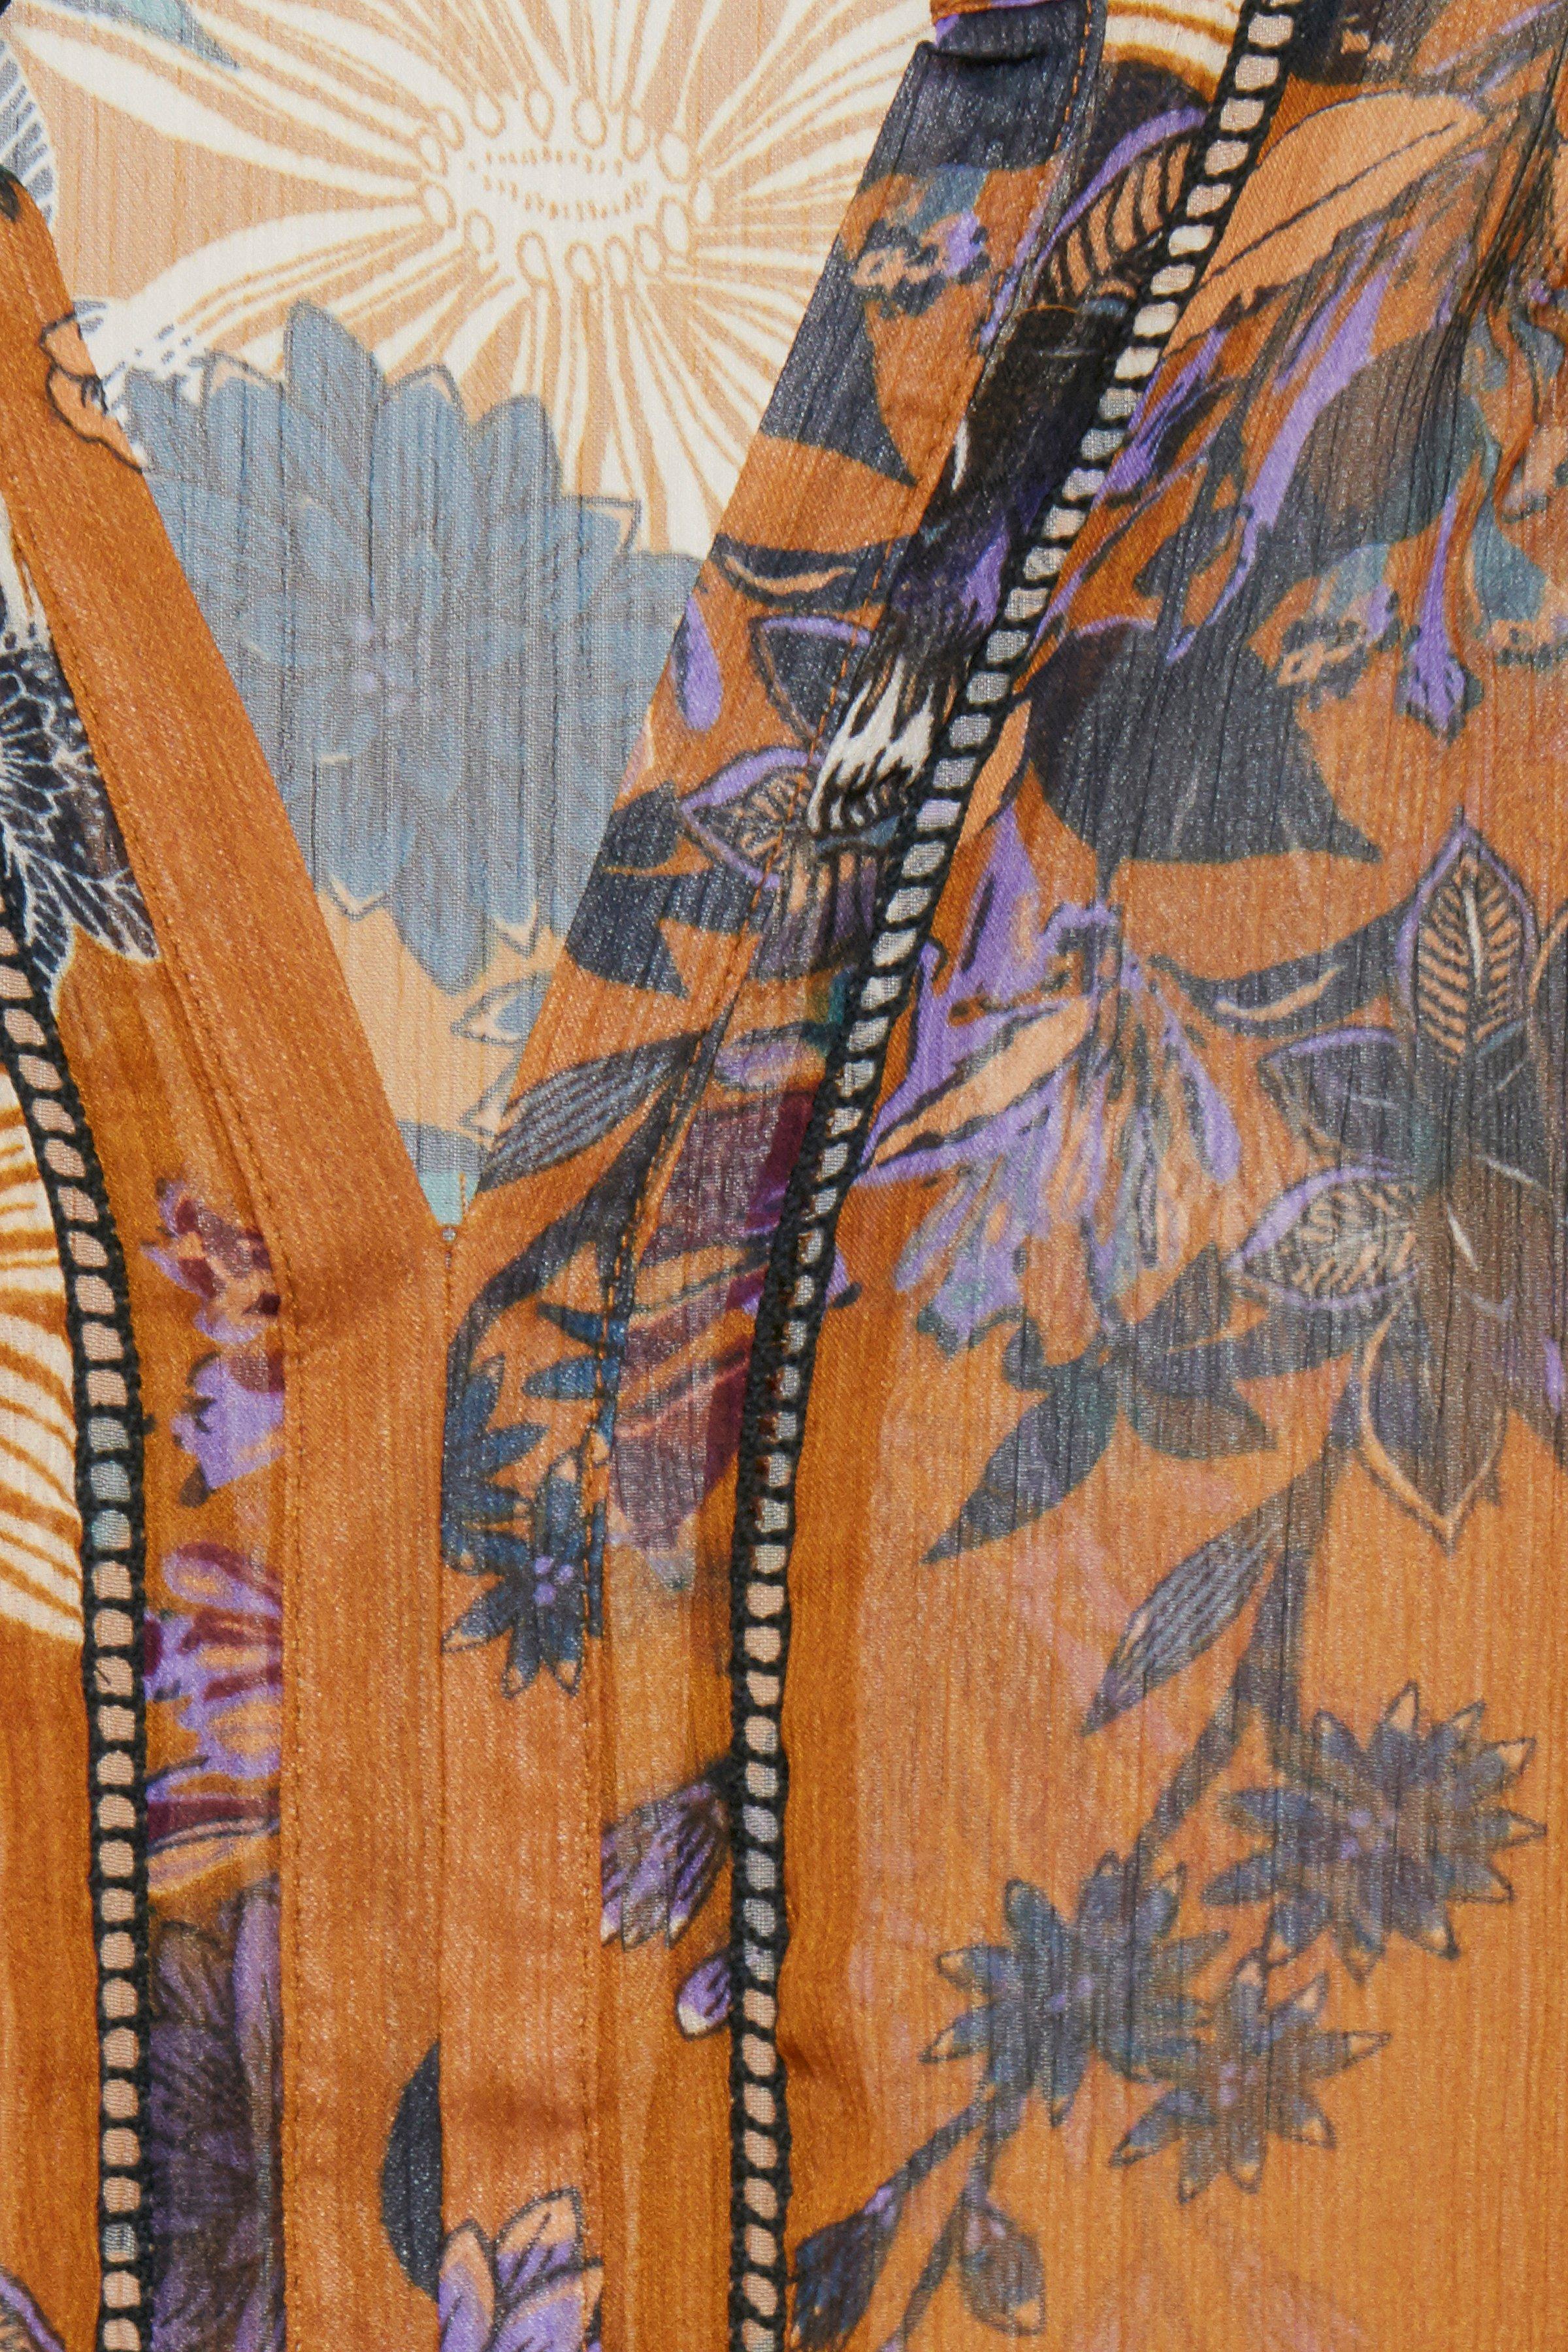 Autumn Spice Langærmet bluse – Køb Autumn Spice Langærmet bluse fra str. XS-XXL her